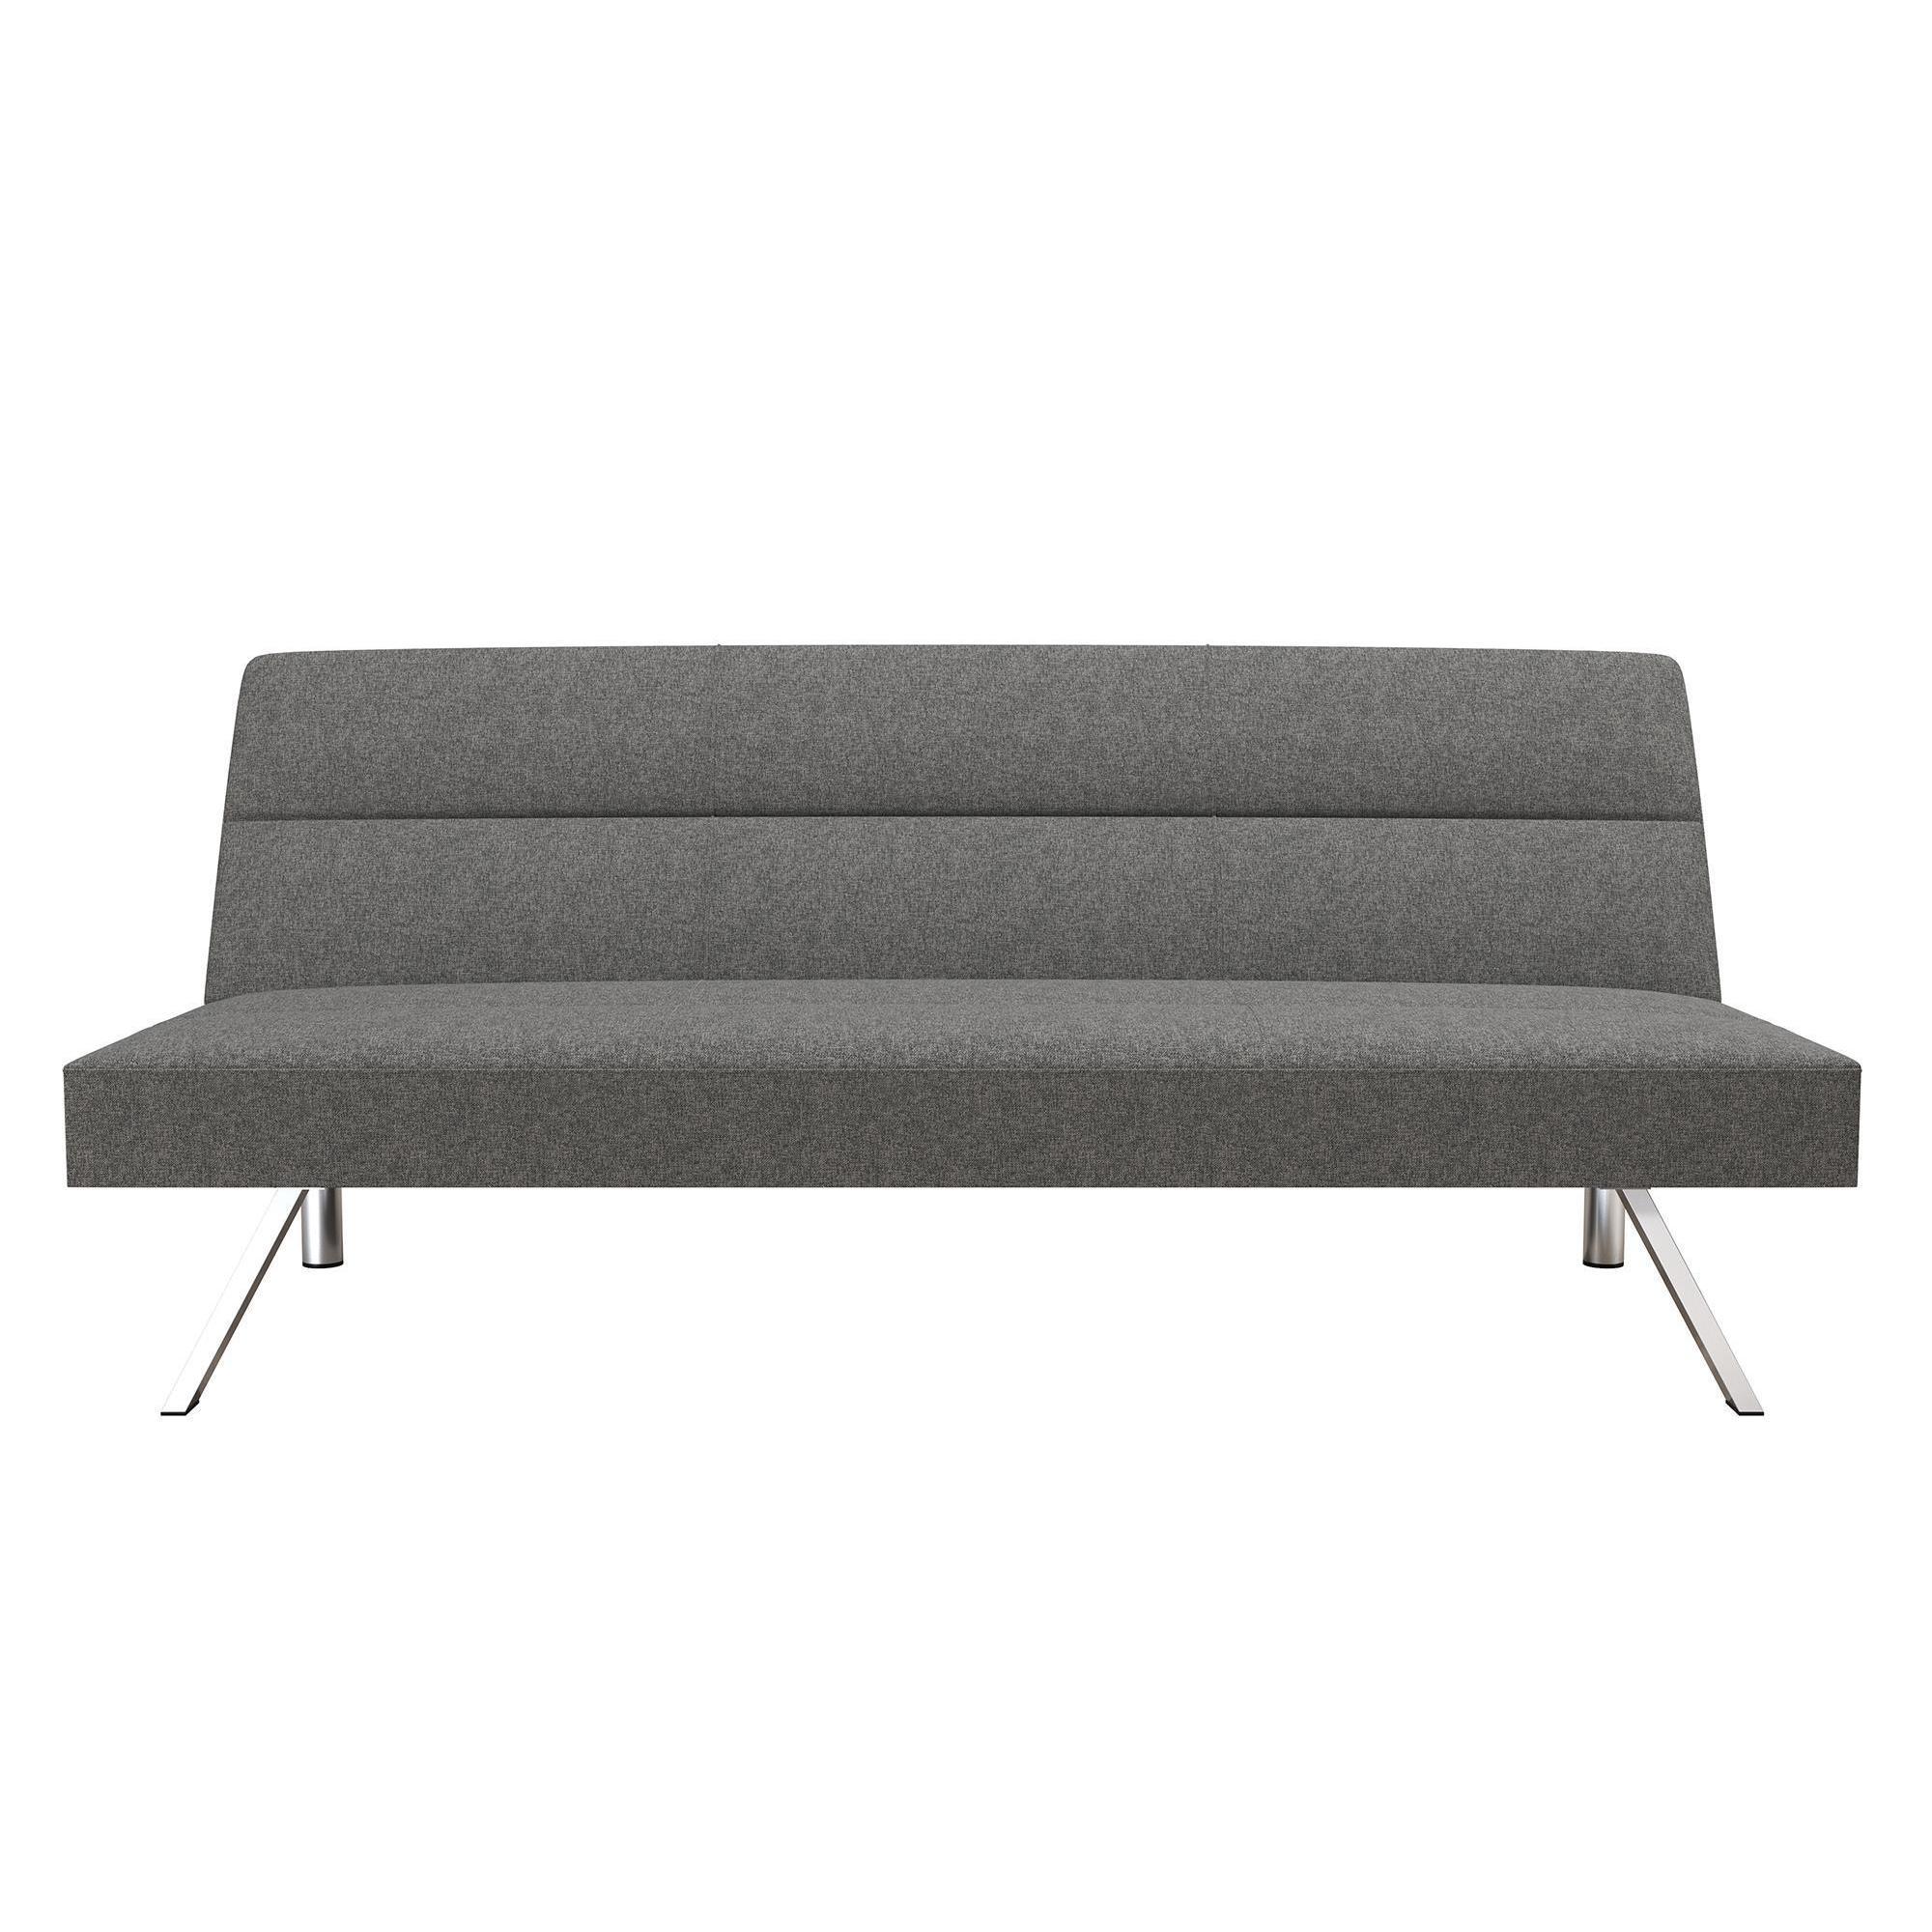 previousnext bedding bedroom foam products memory sourceimage details dhp novogratz furniture topper futon mattress eng